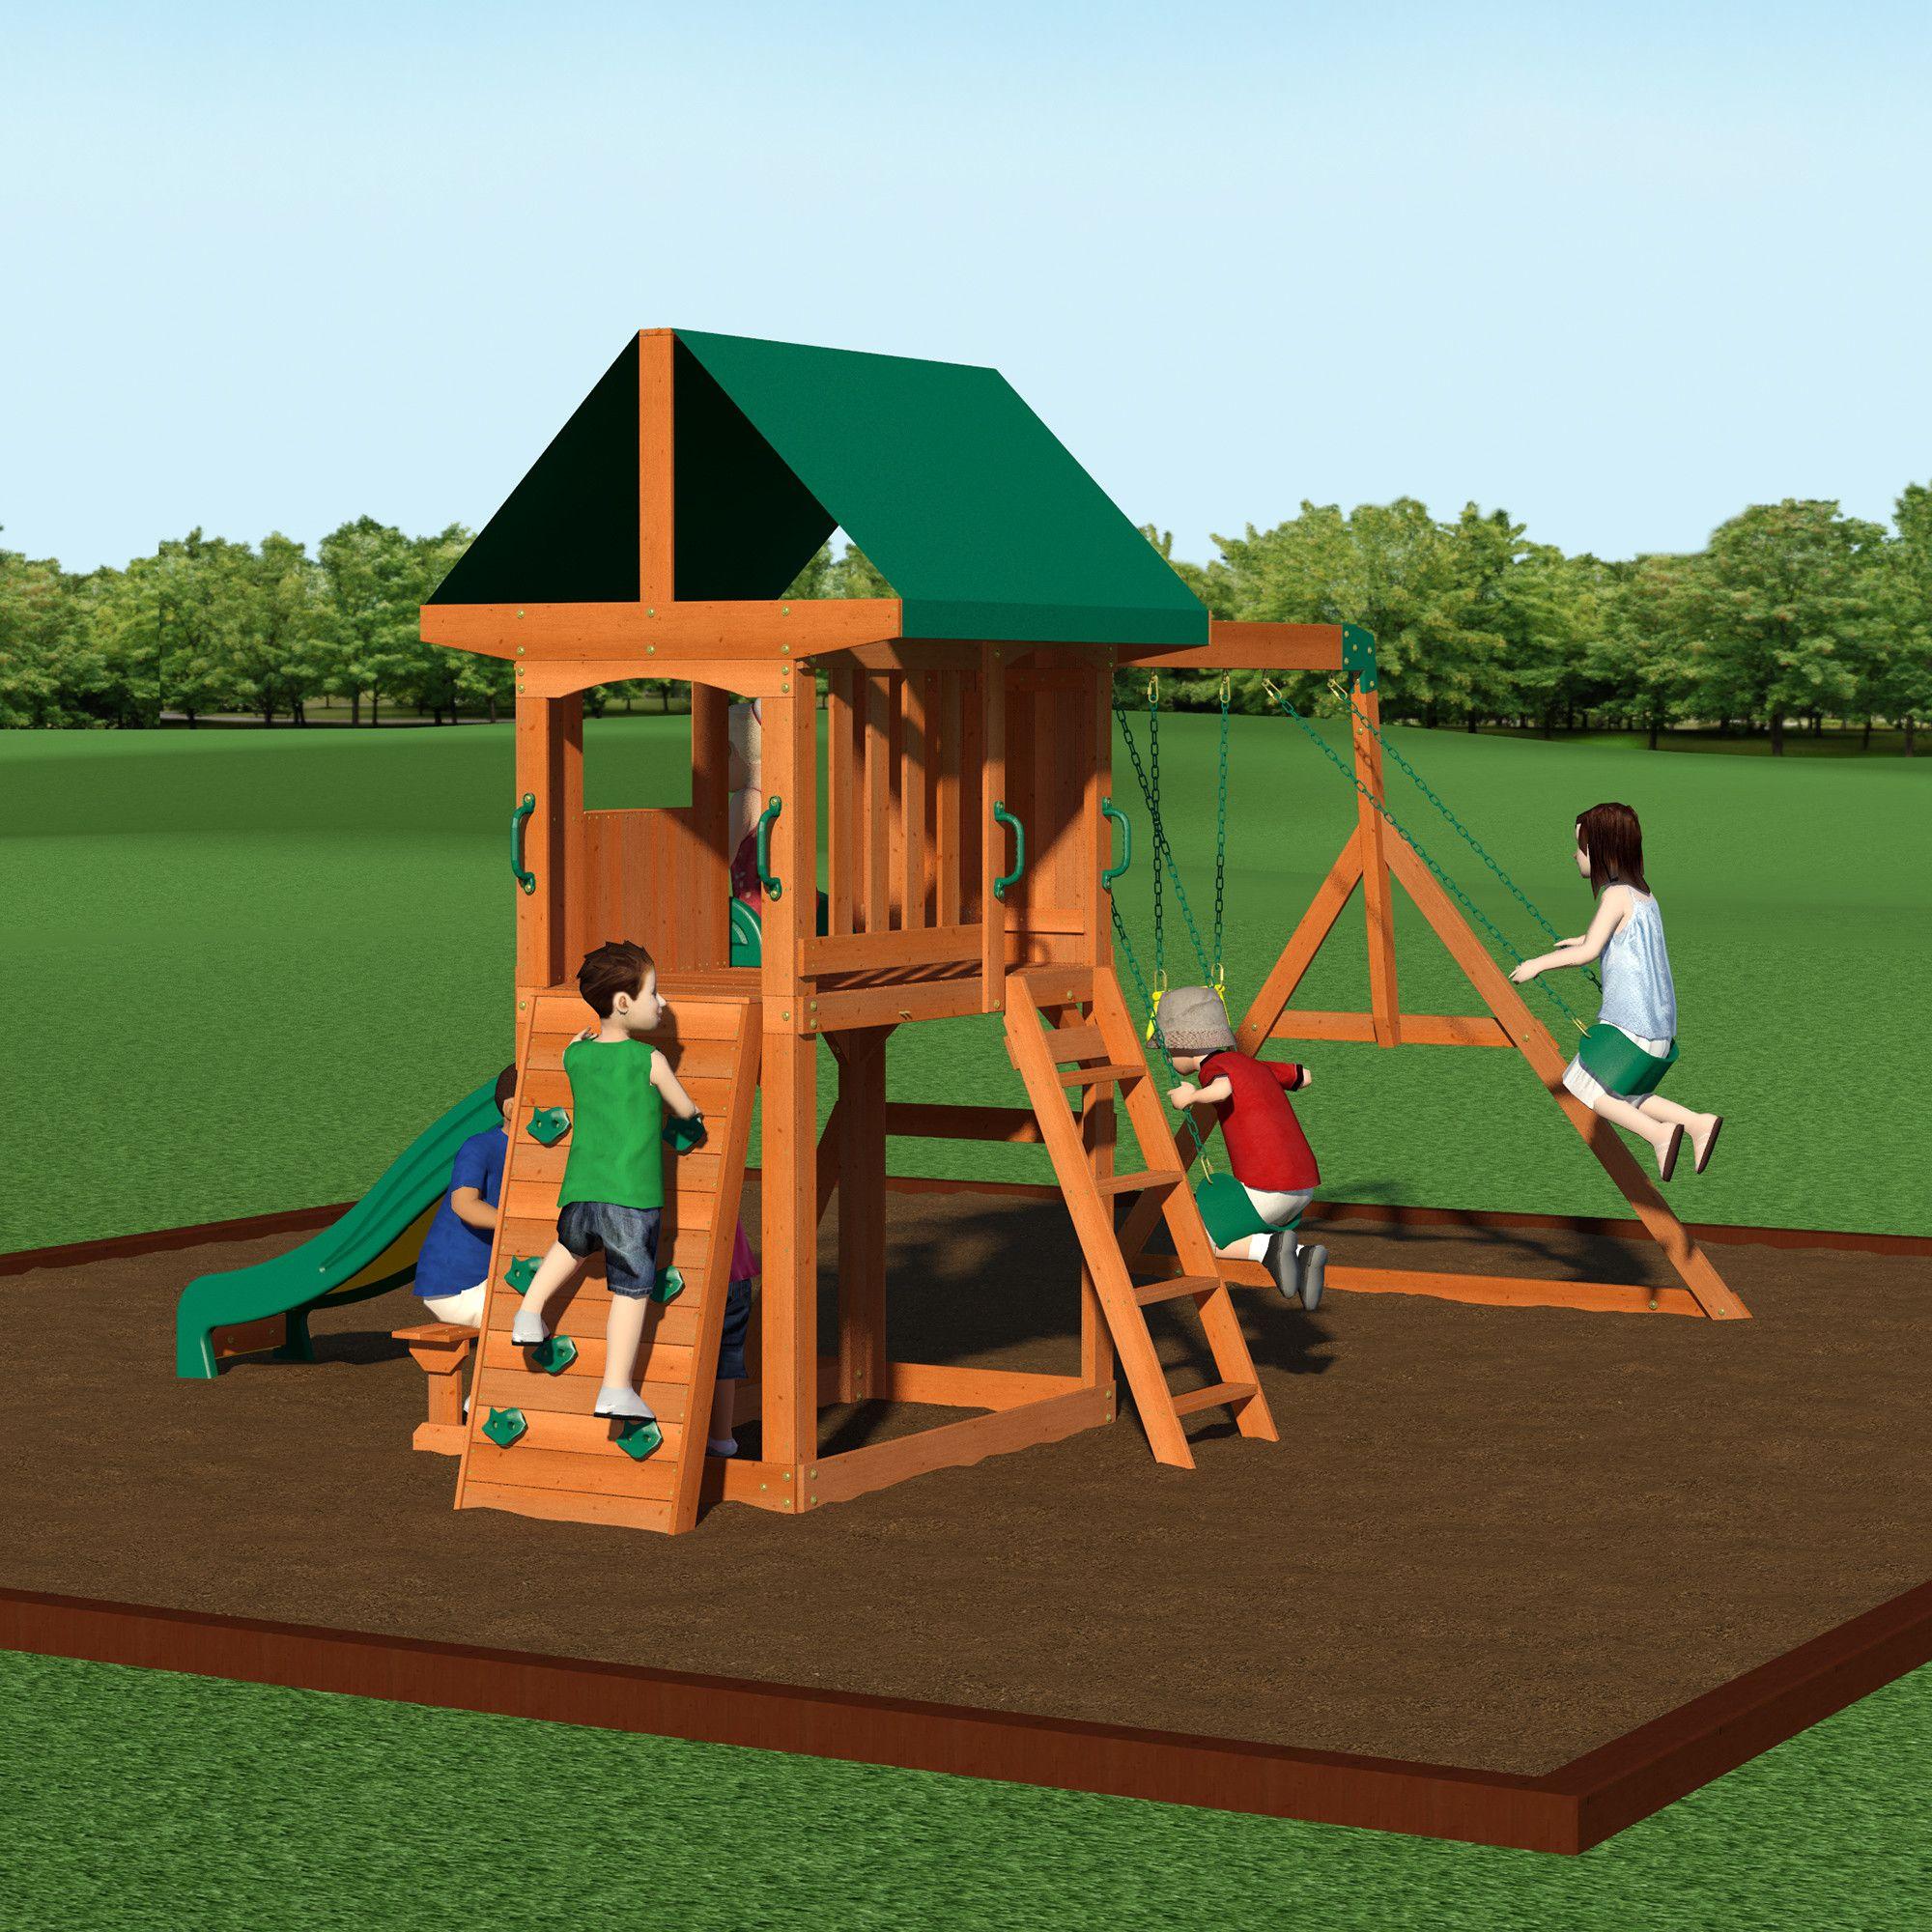 Somerset Cedar Swing Set | Swing set, Cedar swing sets